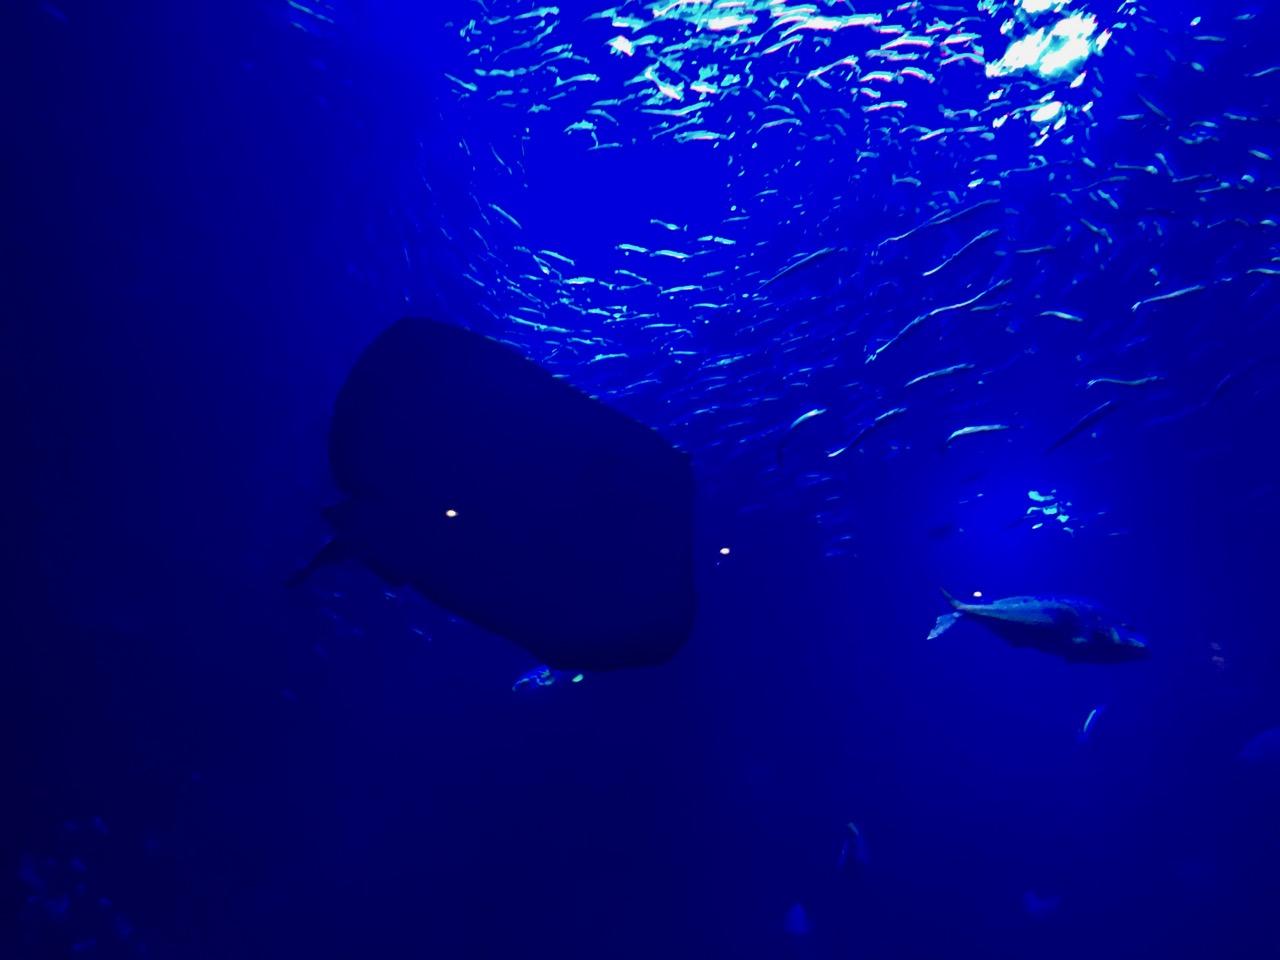 Kyoto Aquarium / 京都水族館